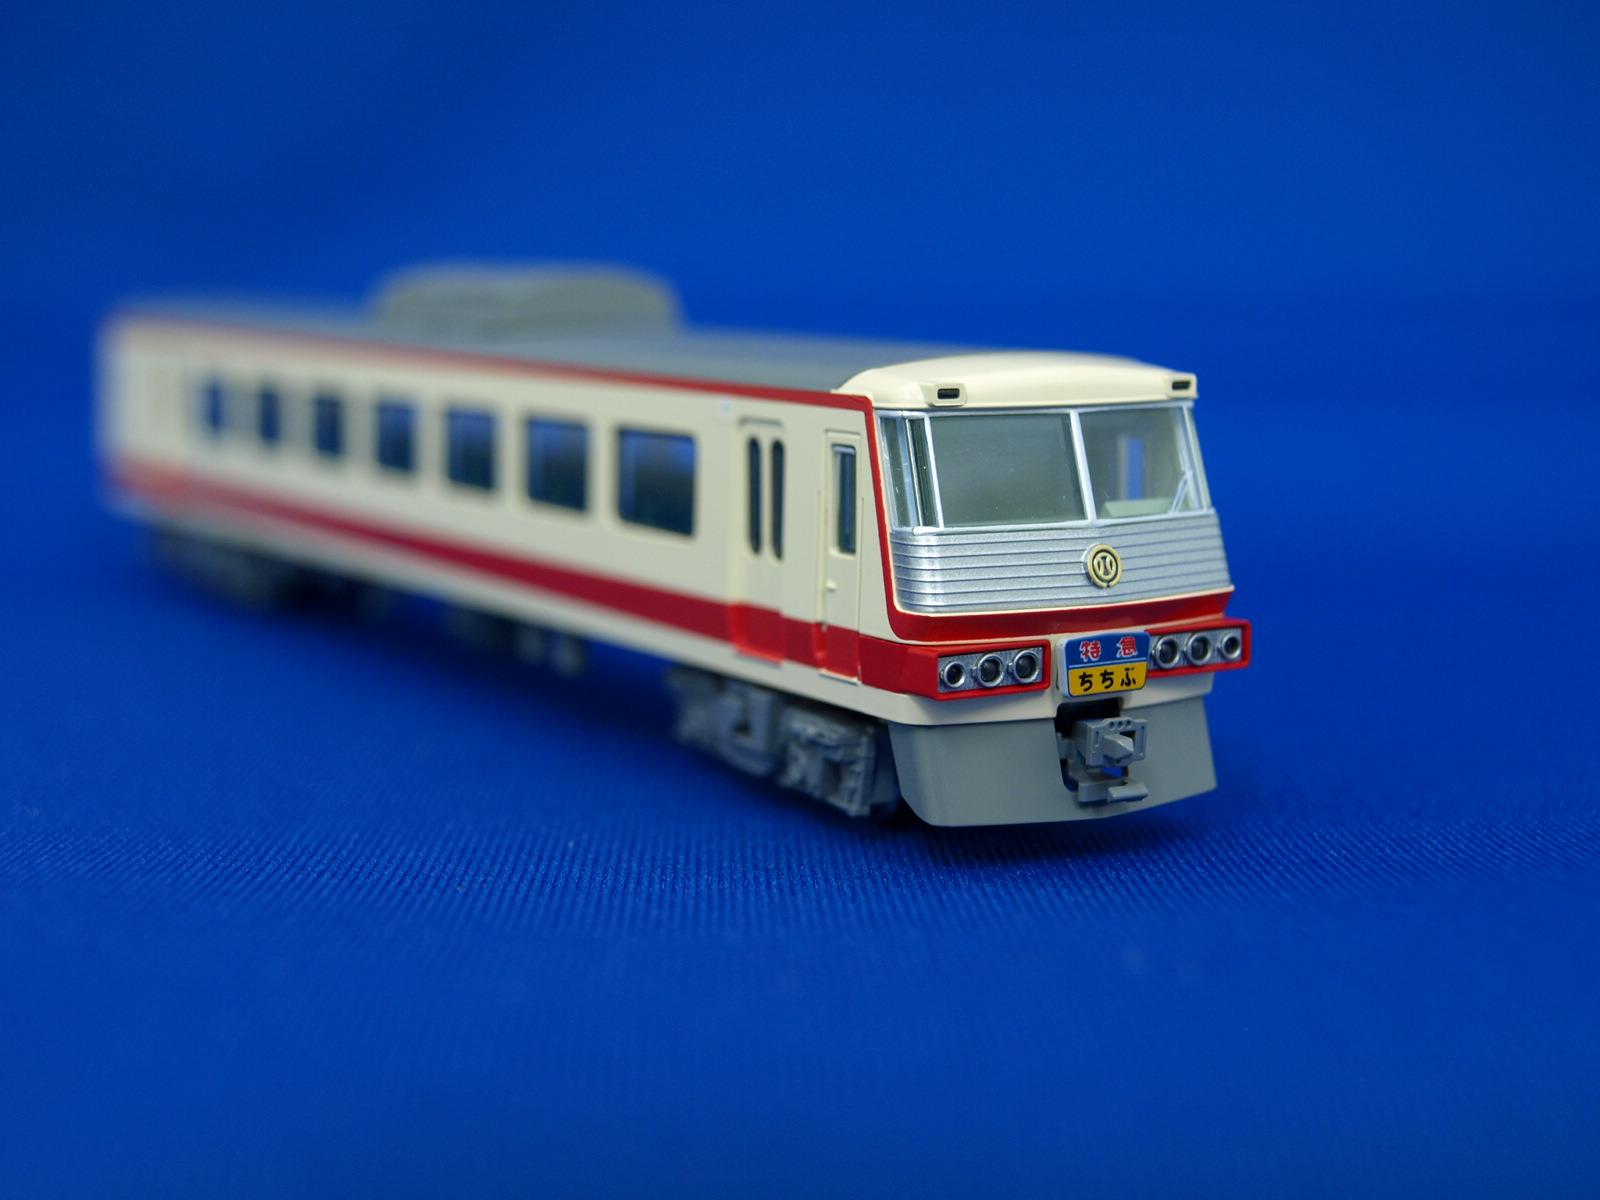 Nゲージ カトー 10-1323  西武鉄道 5000系〈レッドアロー〉初期形 4両セット